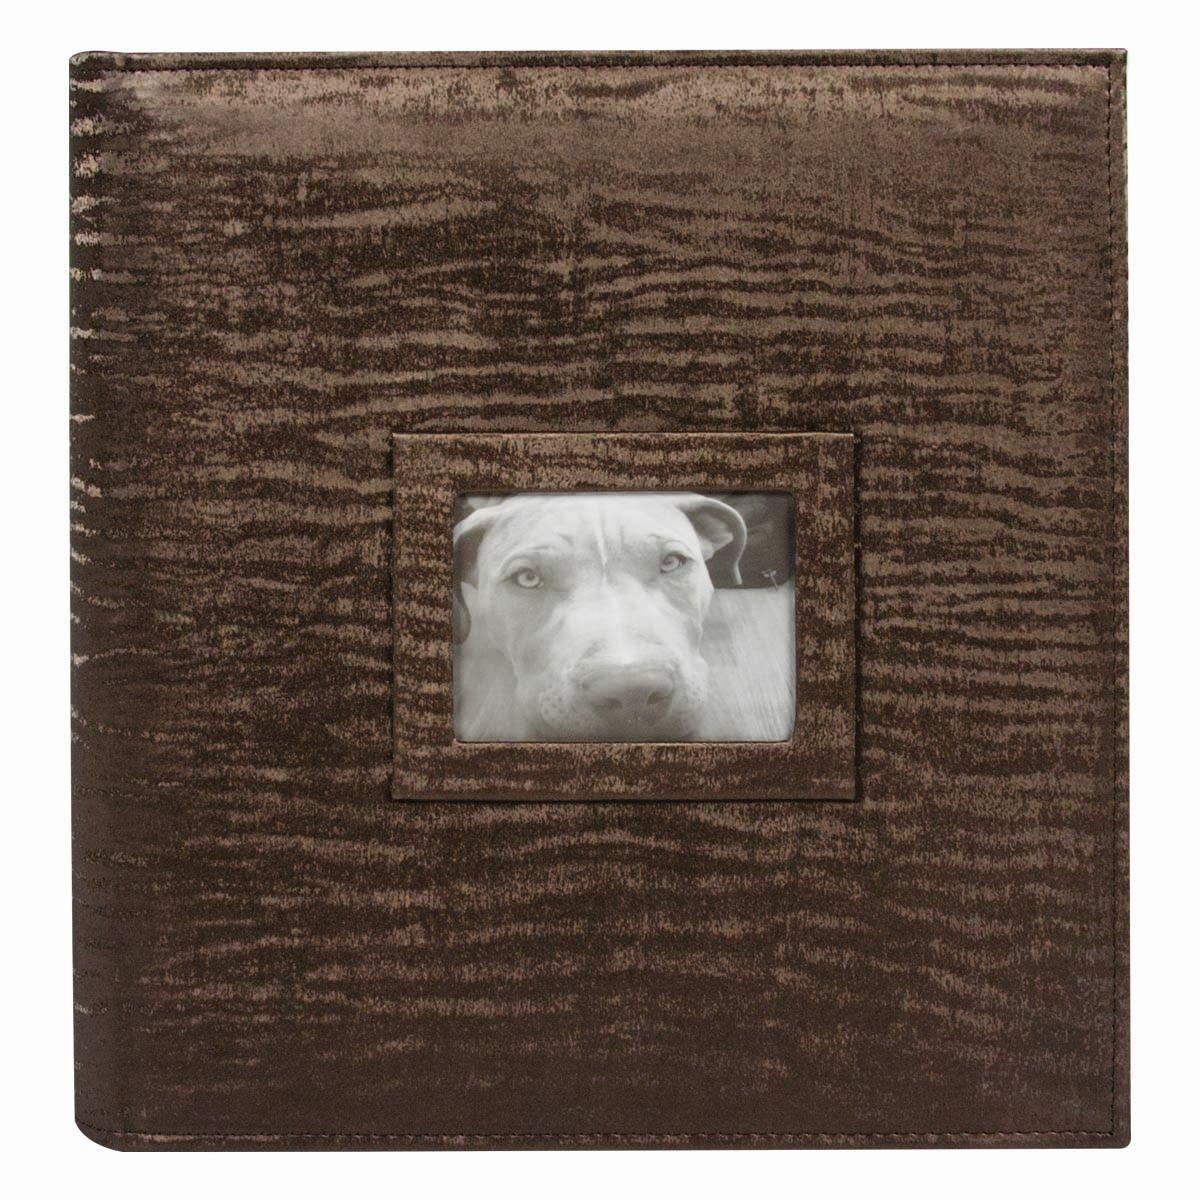 Cheap 3 Ring Scrapbook Album Find 3 Ring Scrapbook Album Deals On